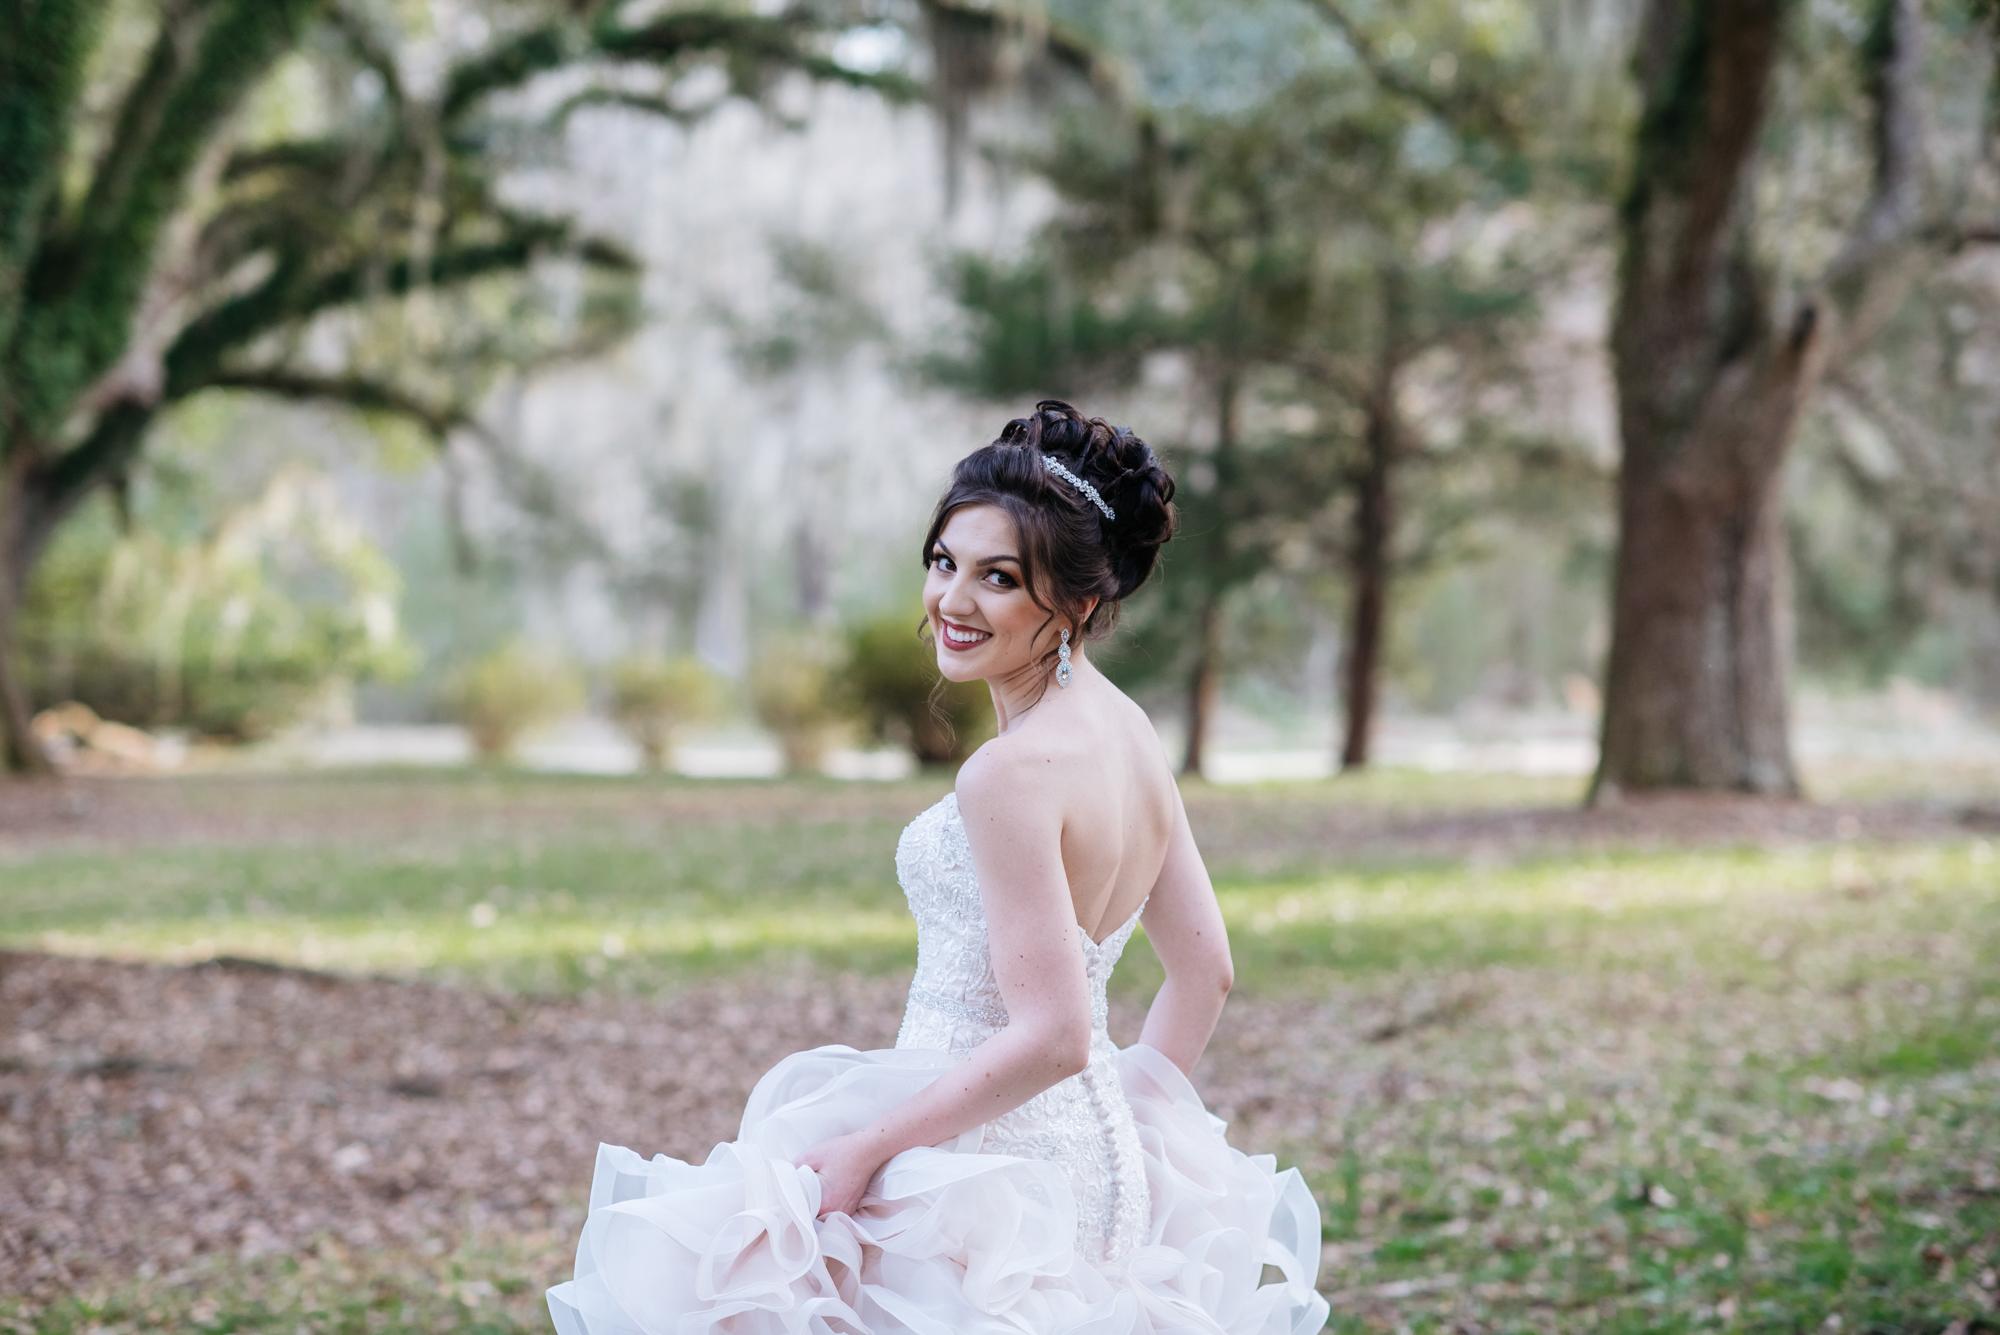 baton-rouge-wedding-photographer-7498.jpg